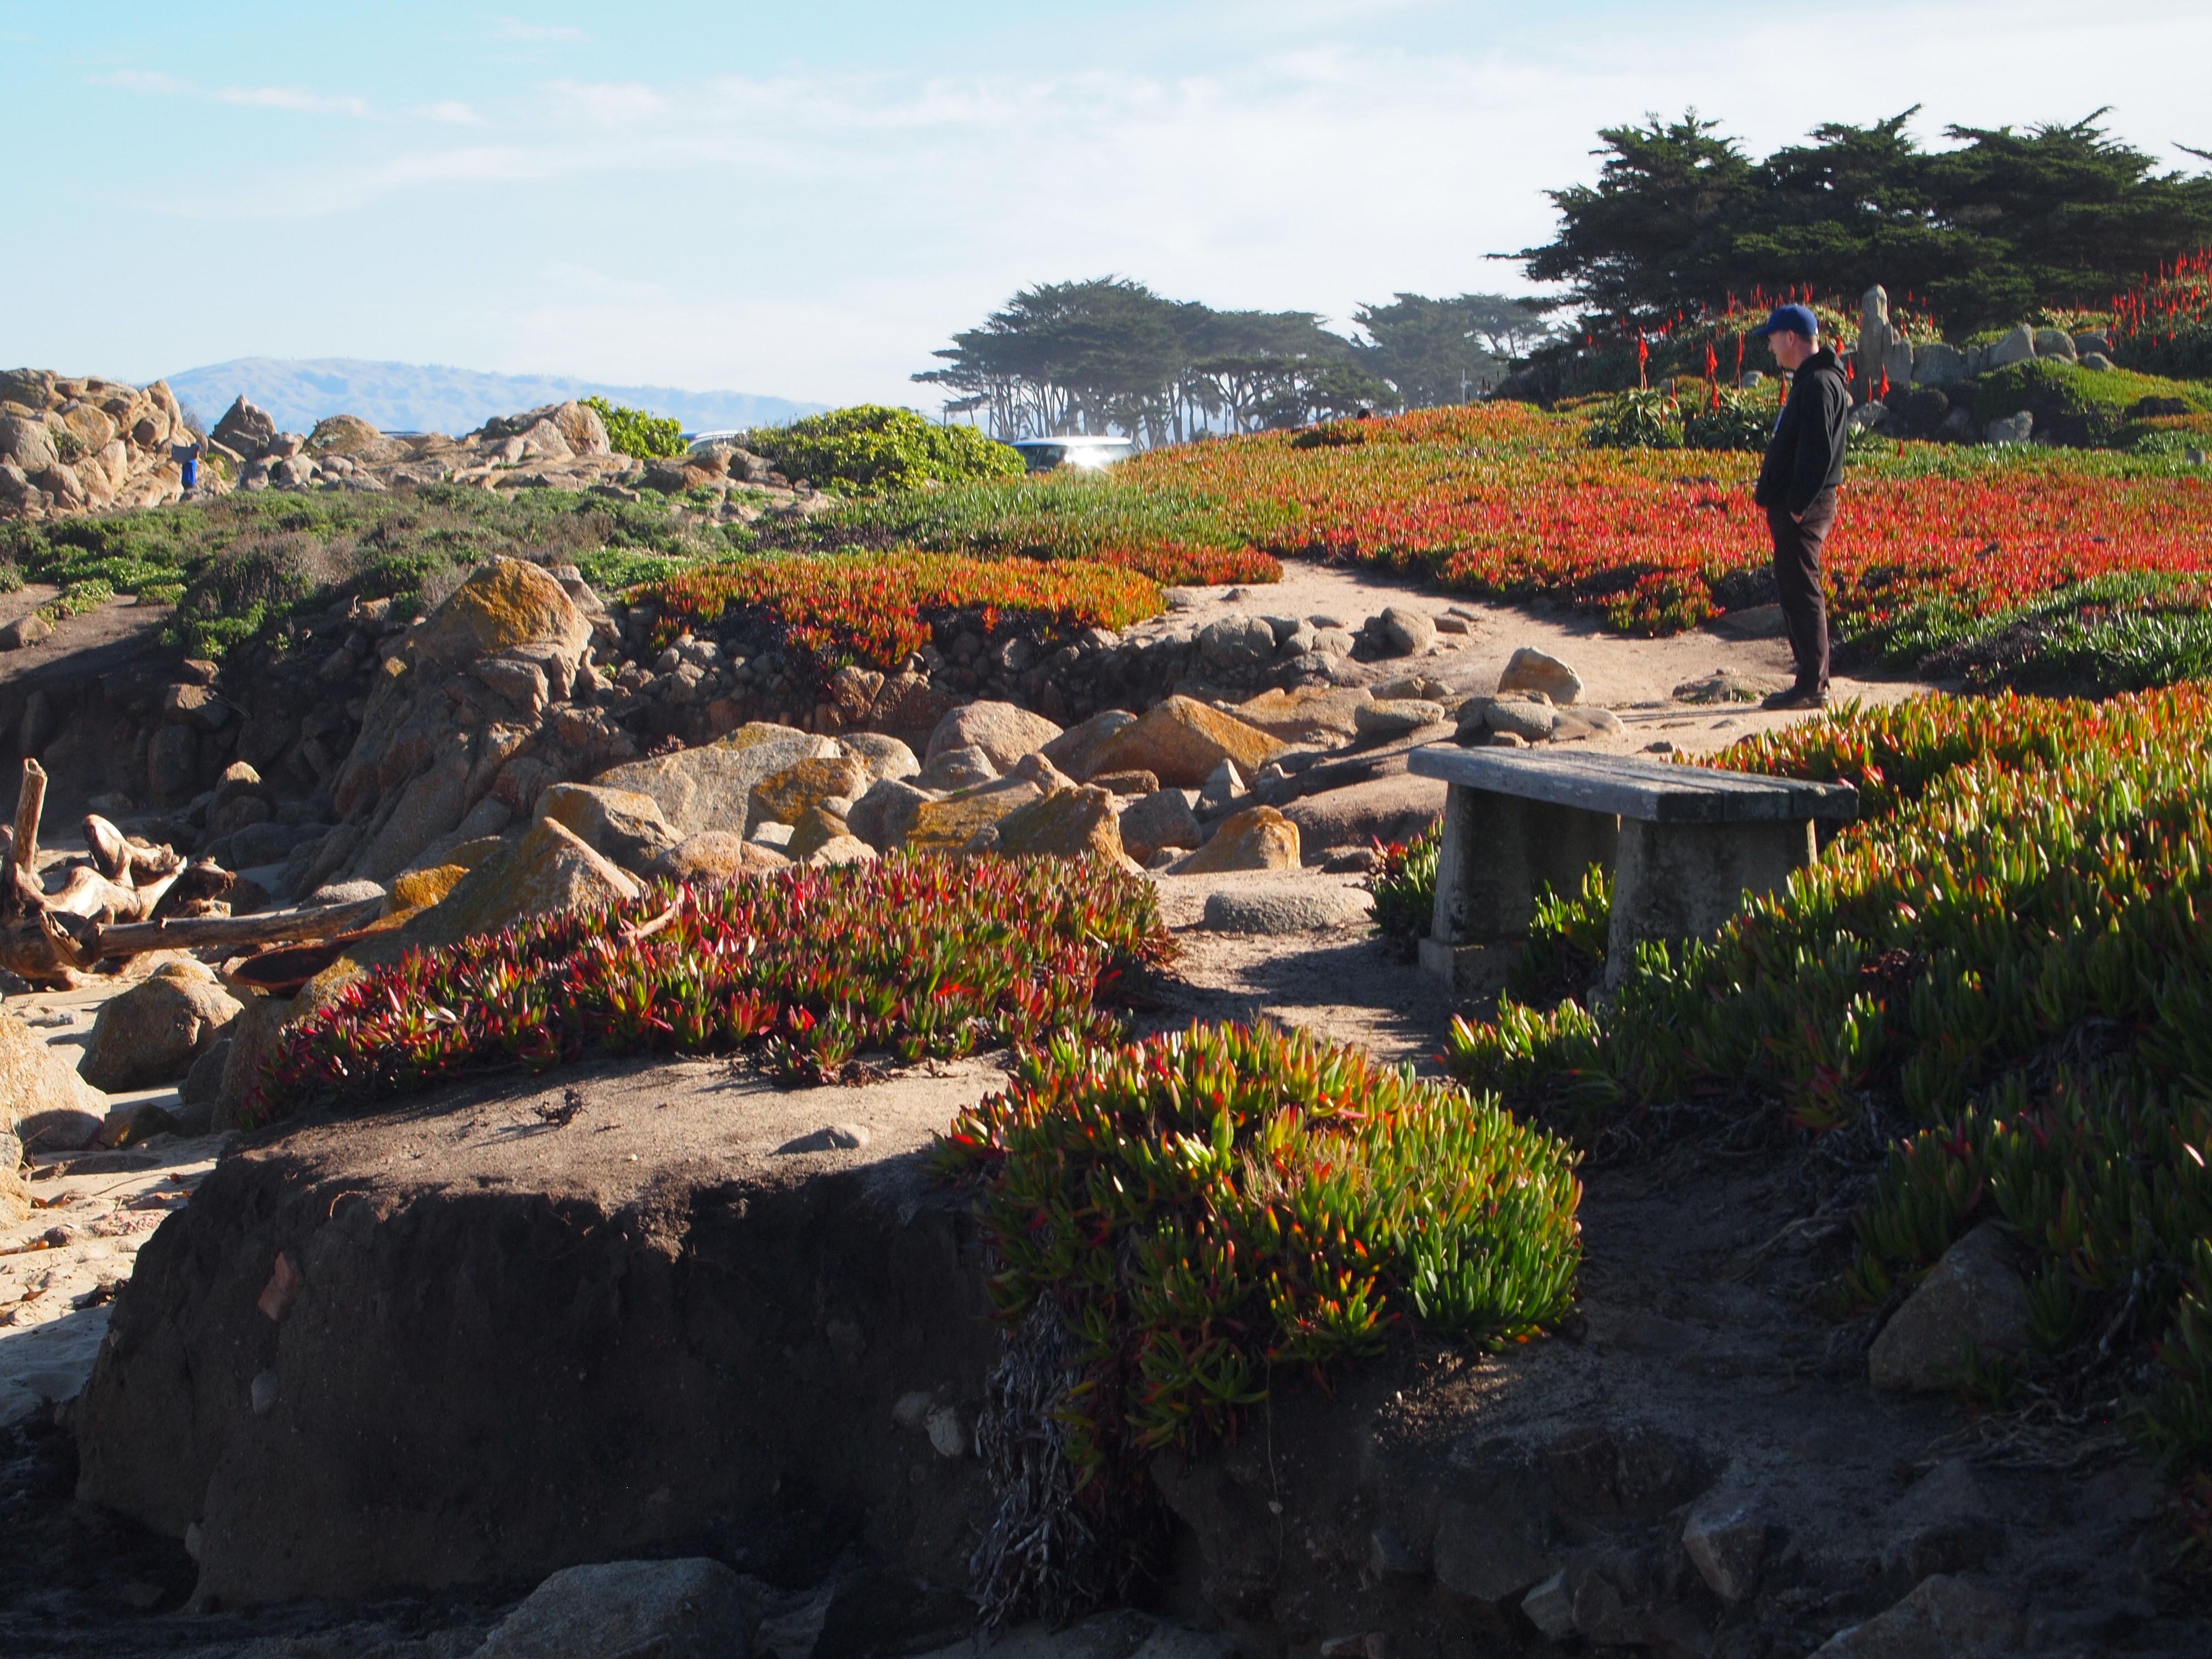 Existing erosion